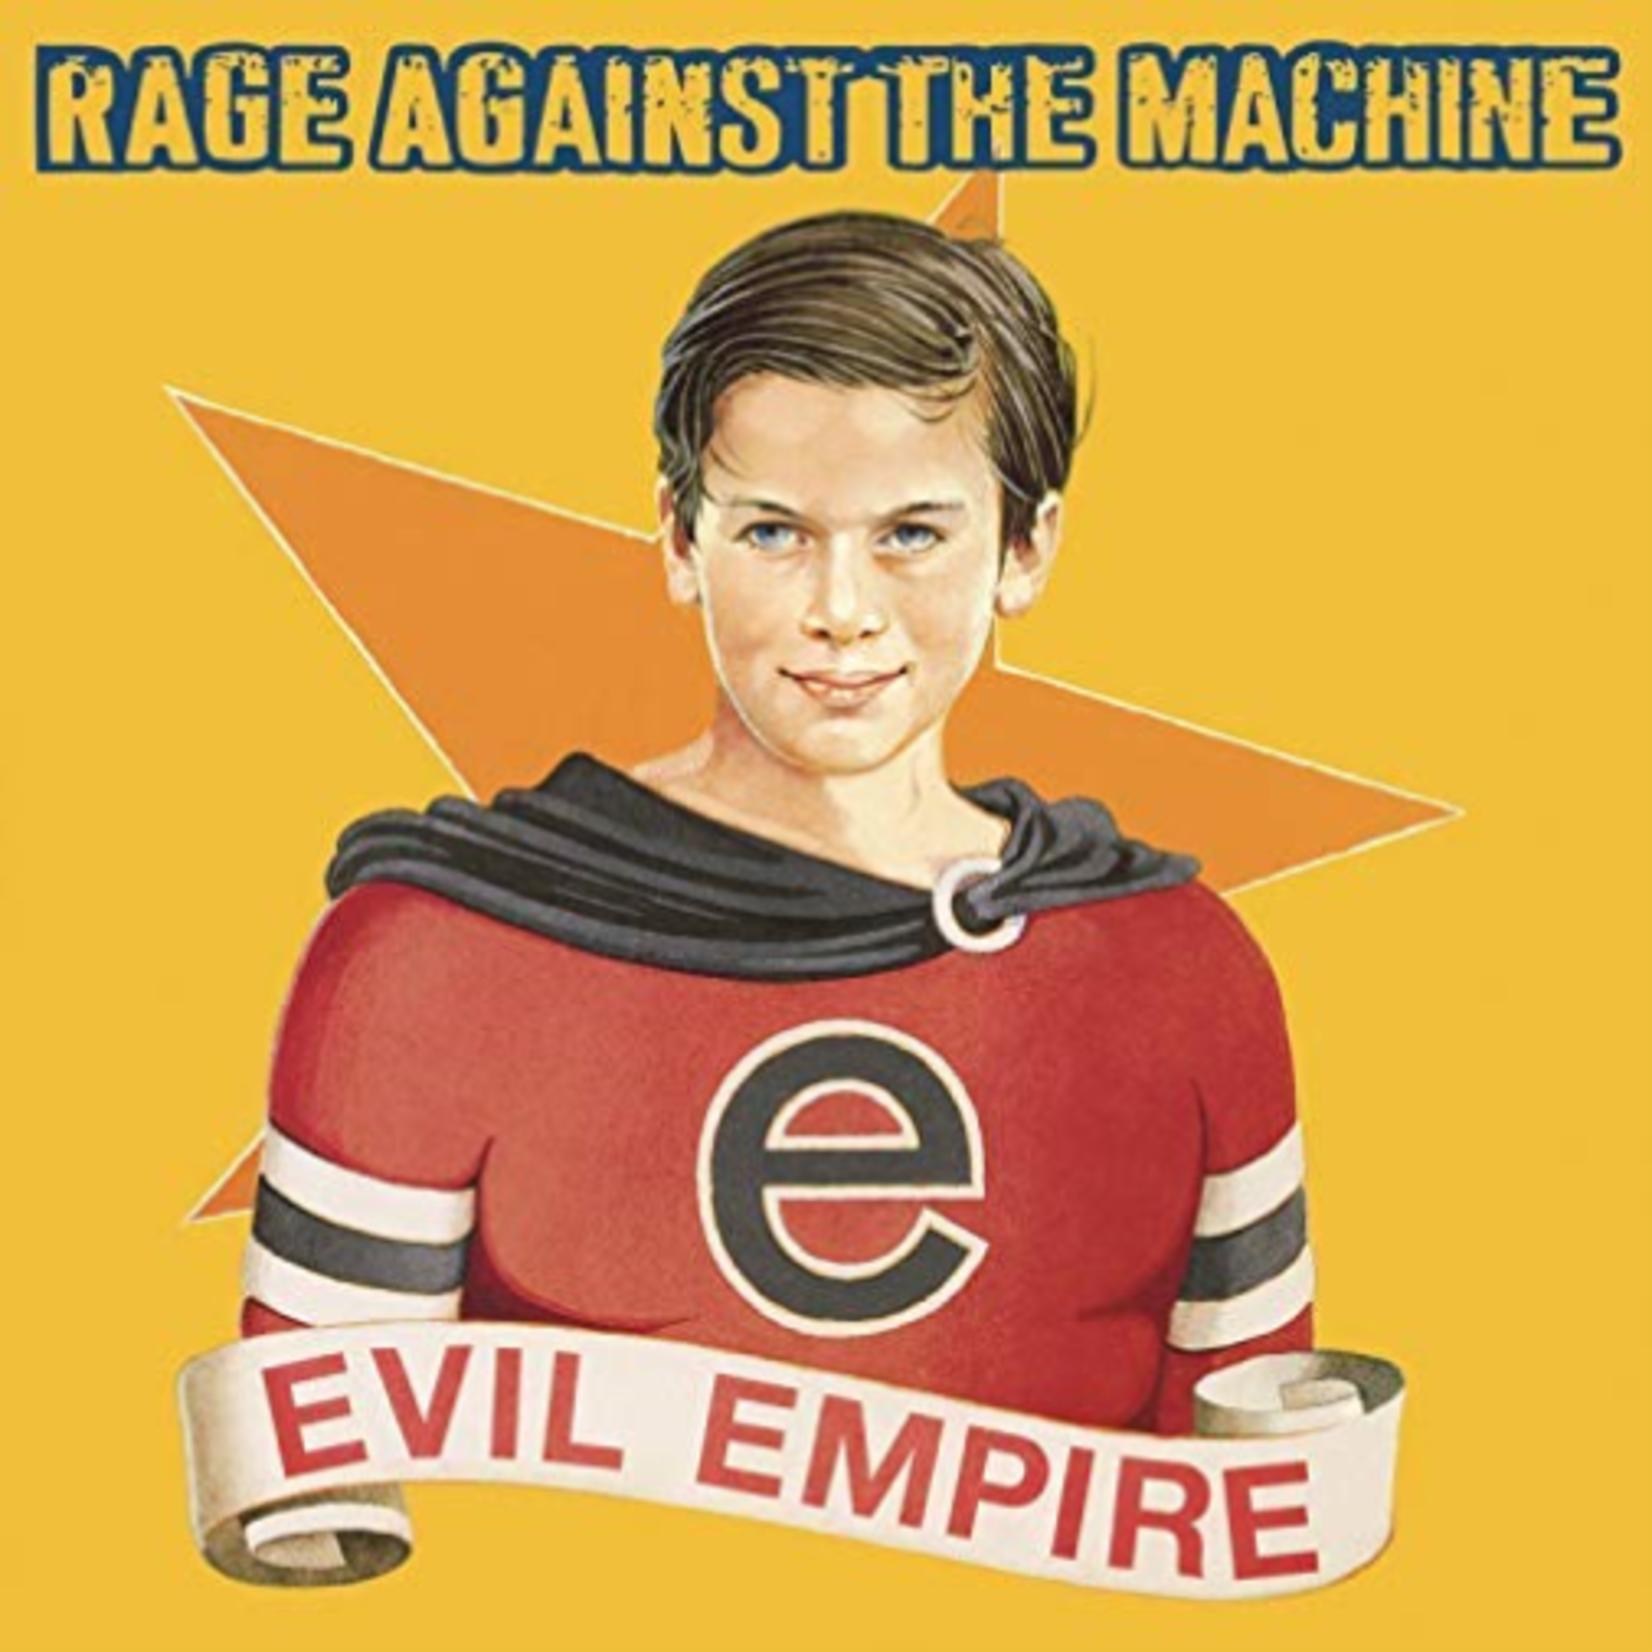 RAGE AGAINST THE MACHINE EVIL EMPIRE